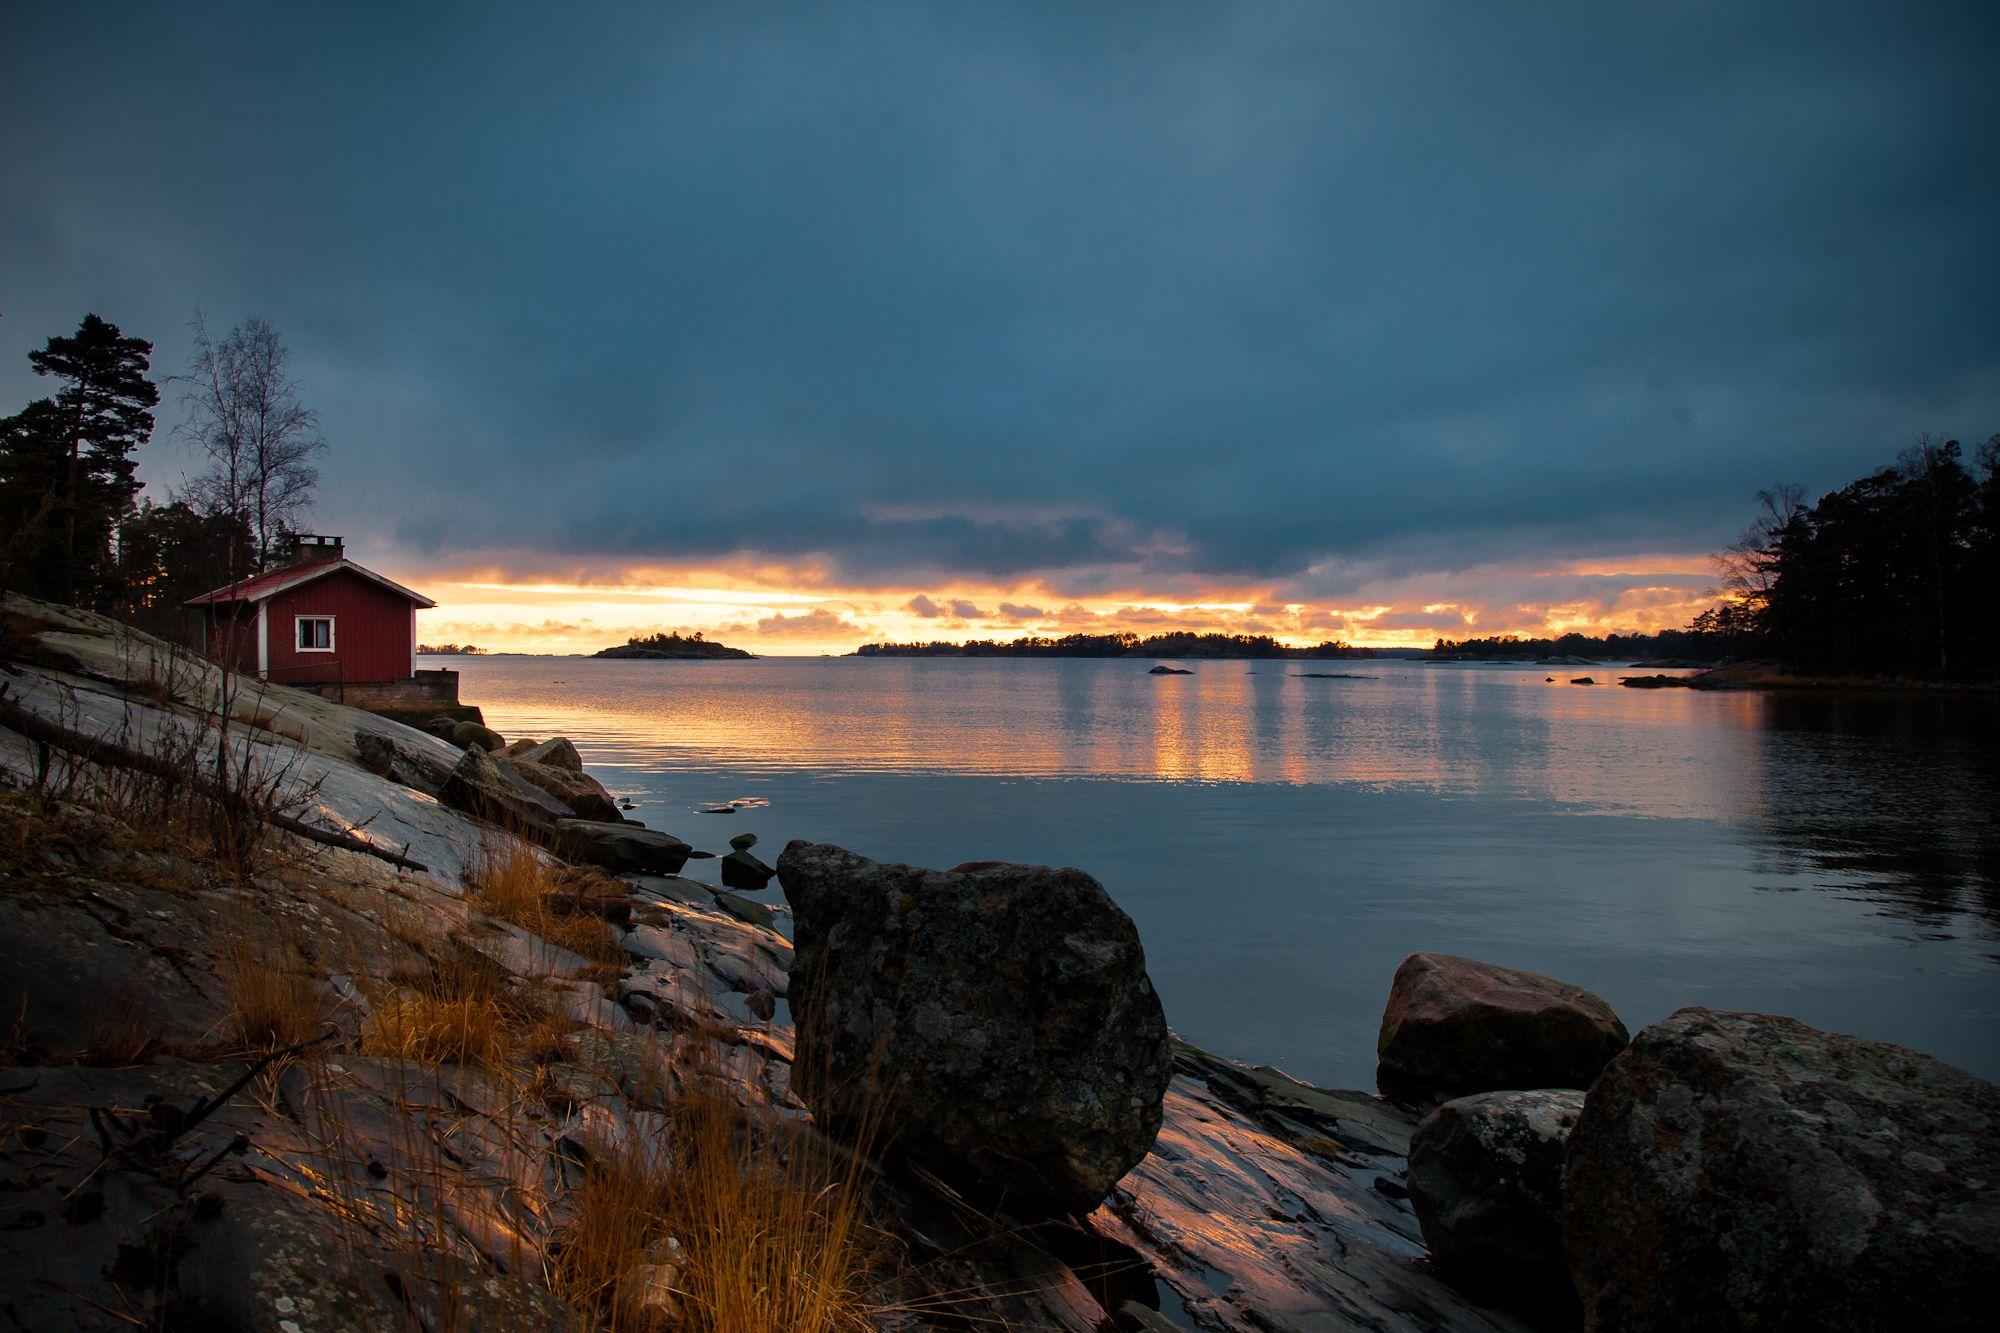 finland landscape - Google Search   Finland   Pinterest   Finland